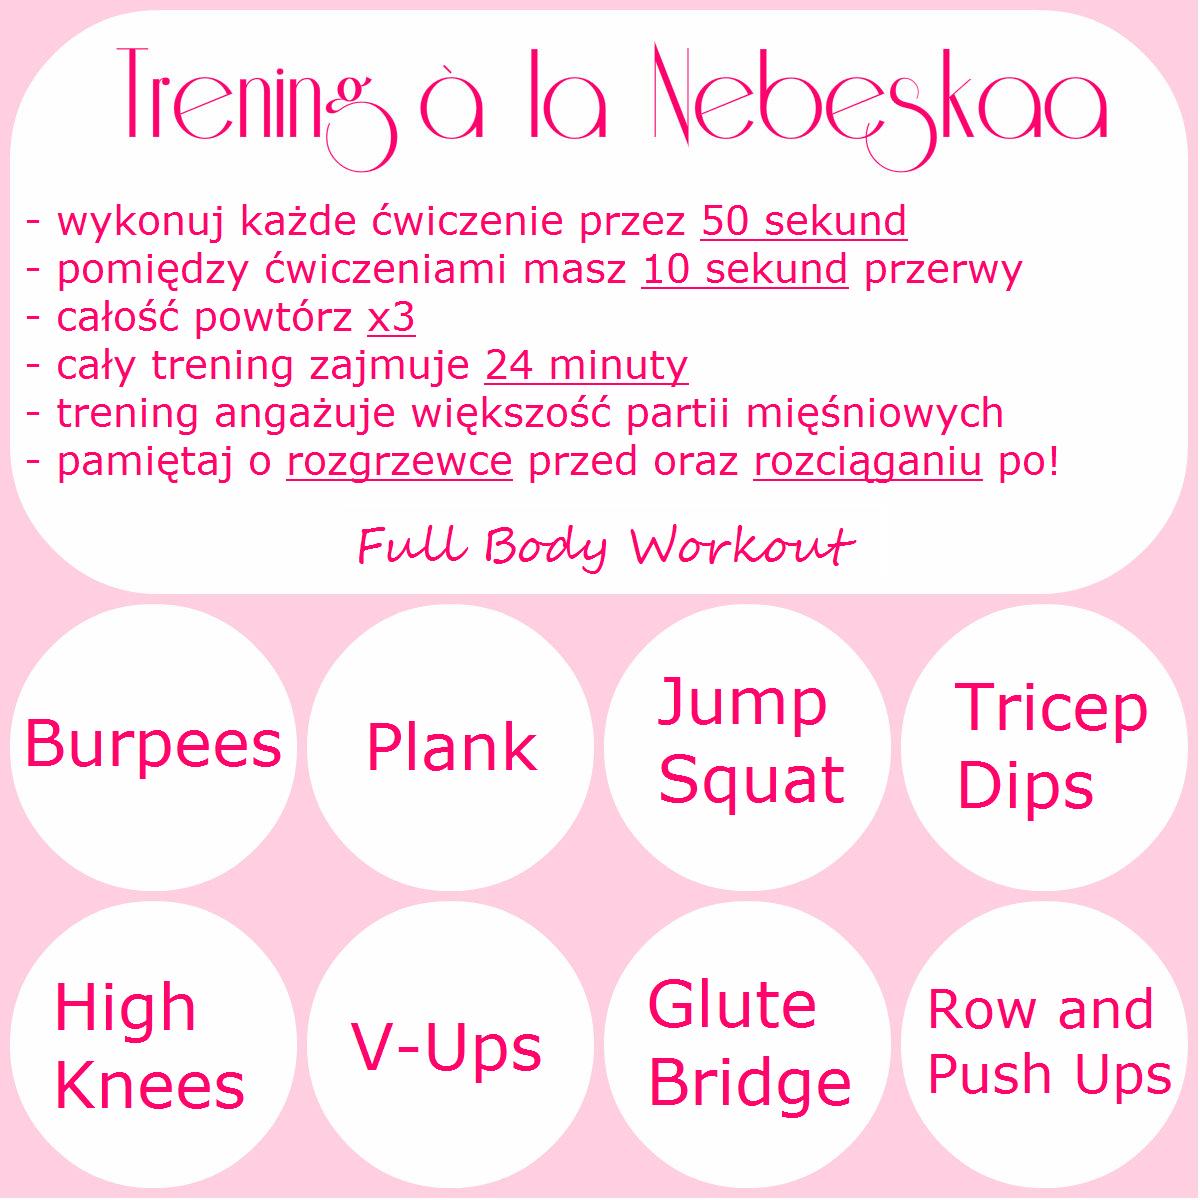 http://nebeskaa.blogspot.com/2014/03/trening-la-nebeskaa.html